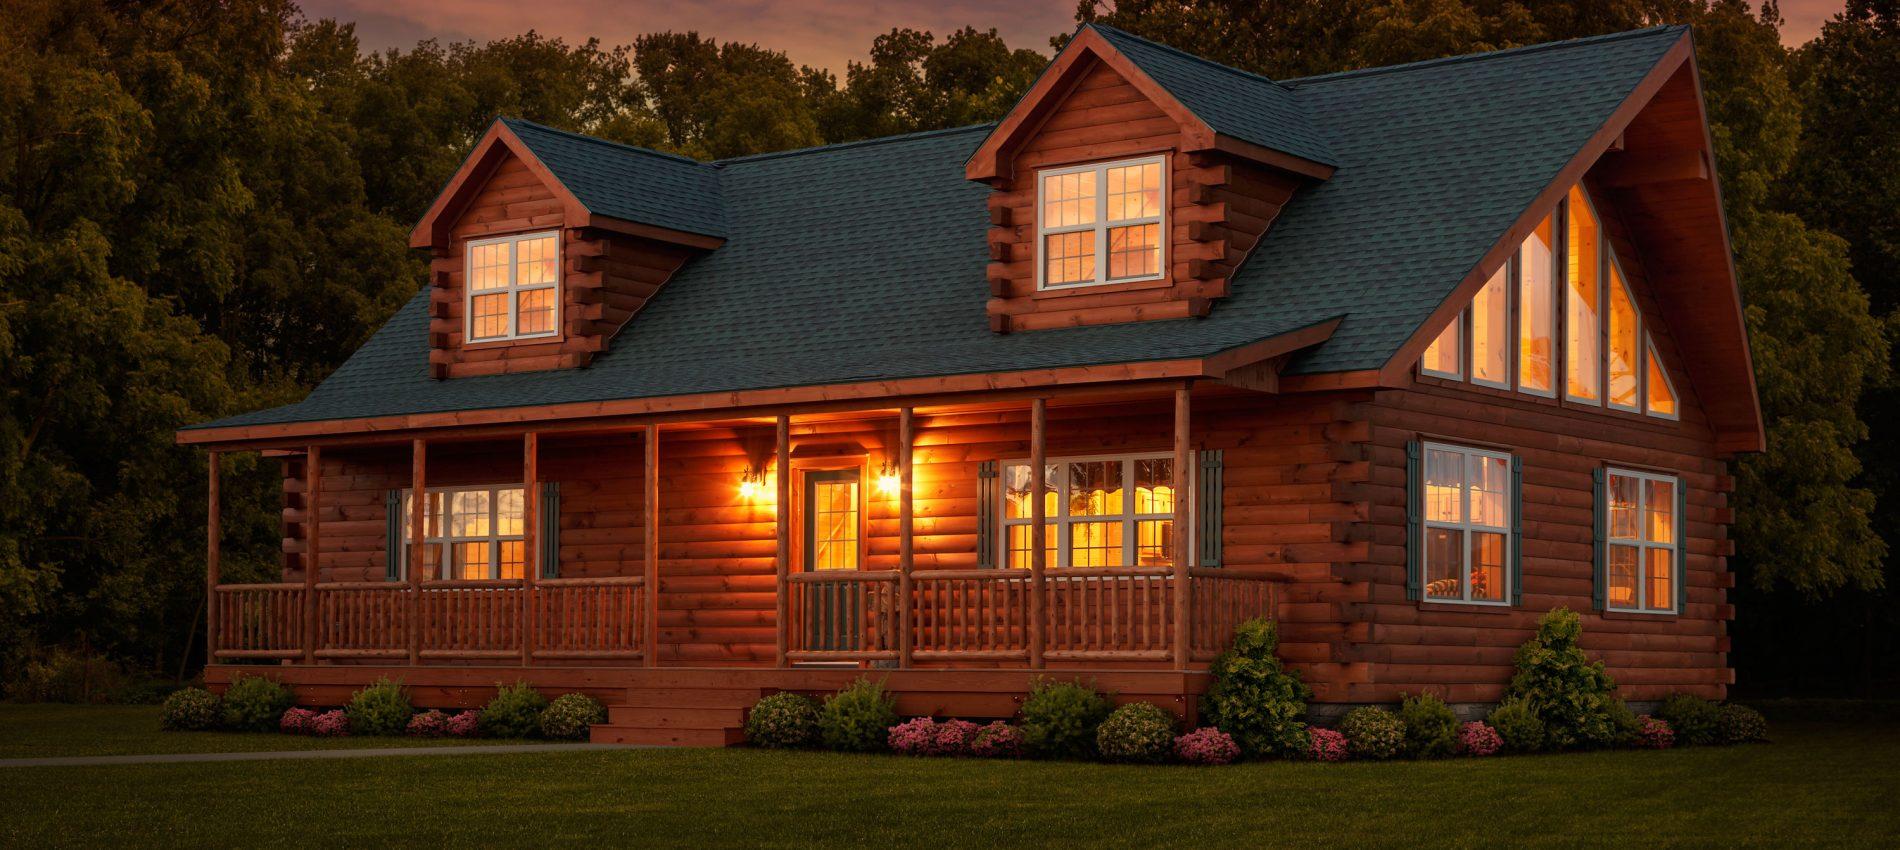 Log Cabins For Sale  Log Cabin Homes  Log Houses  Zook